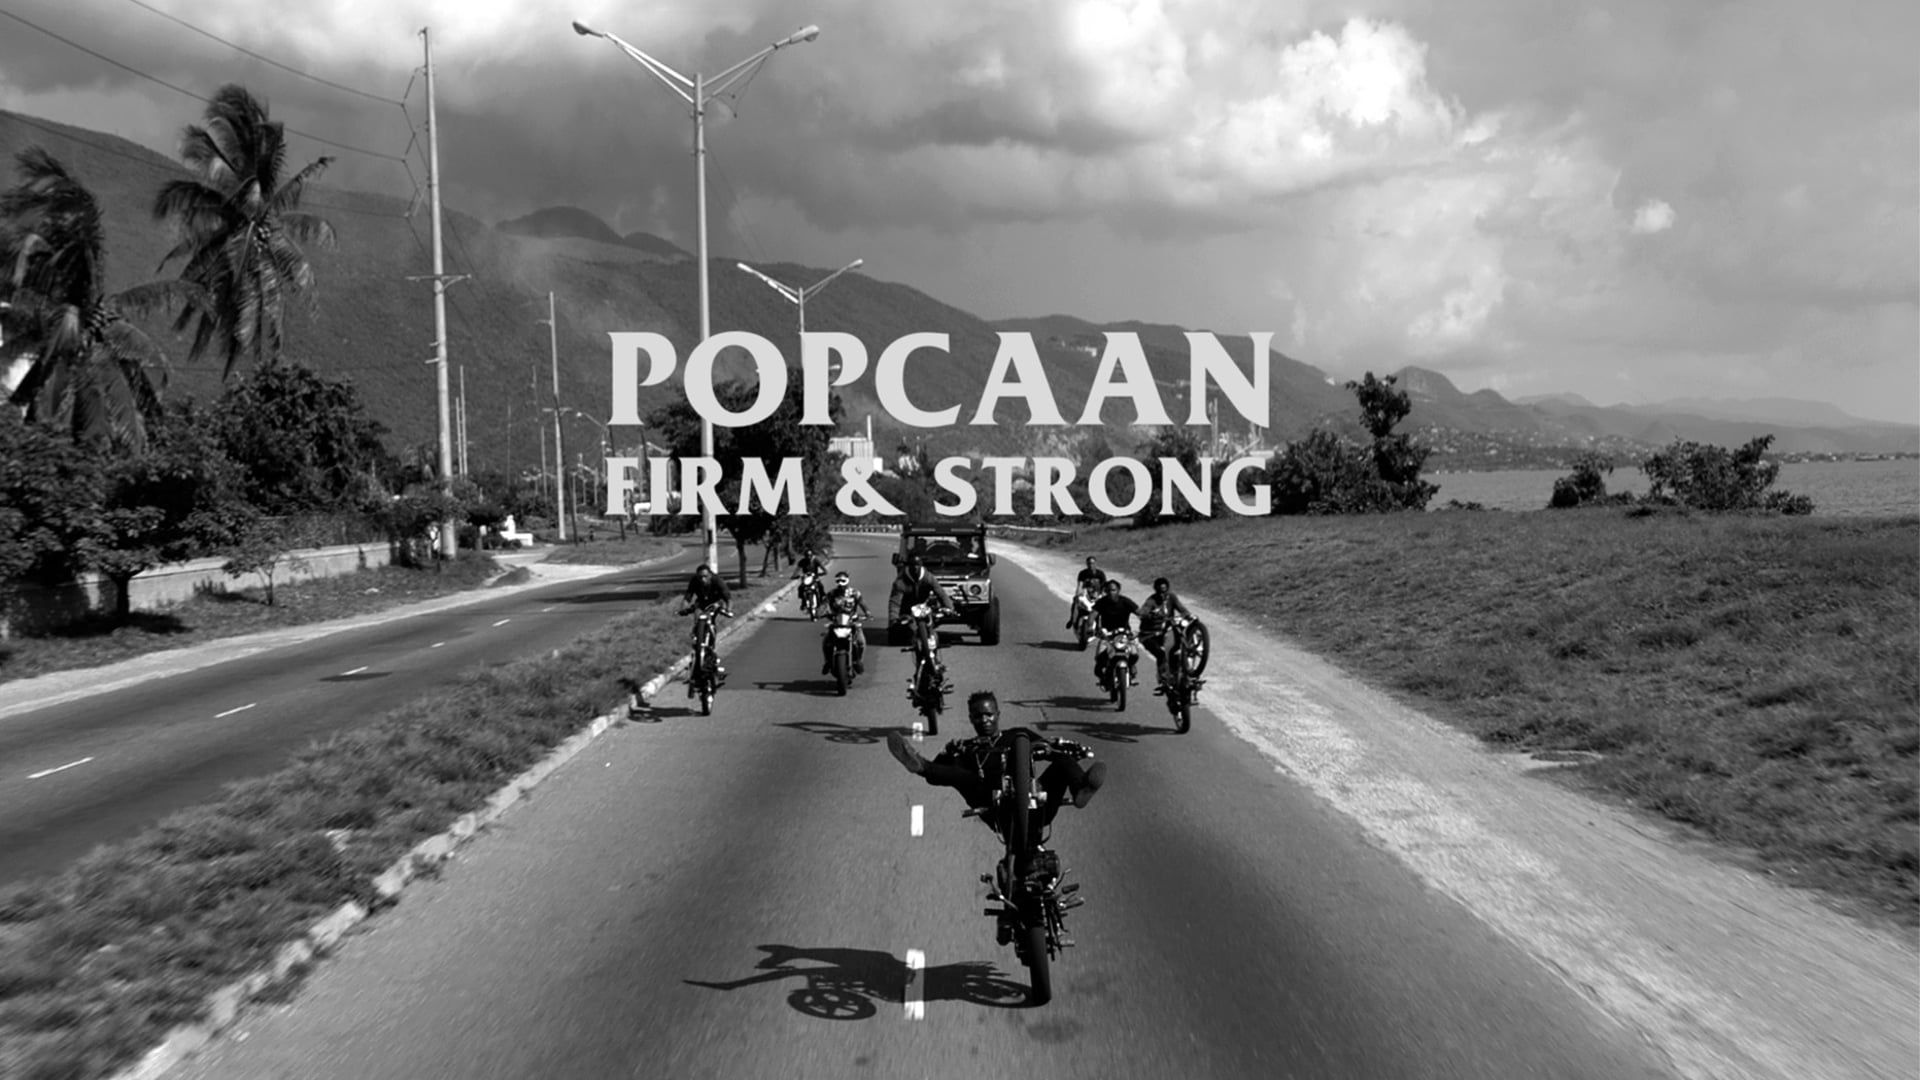 POPCAAN - Firm & Strong